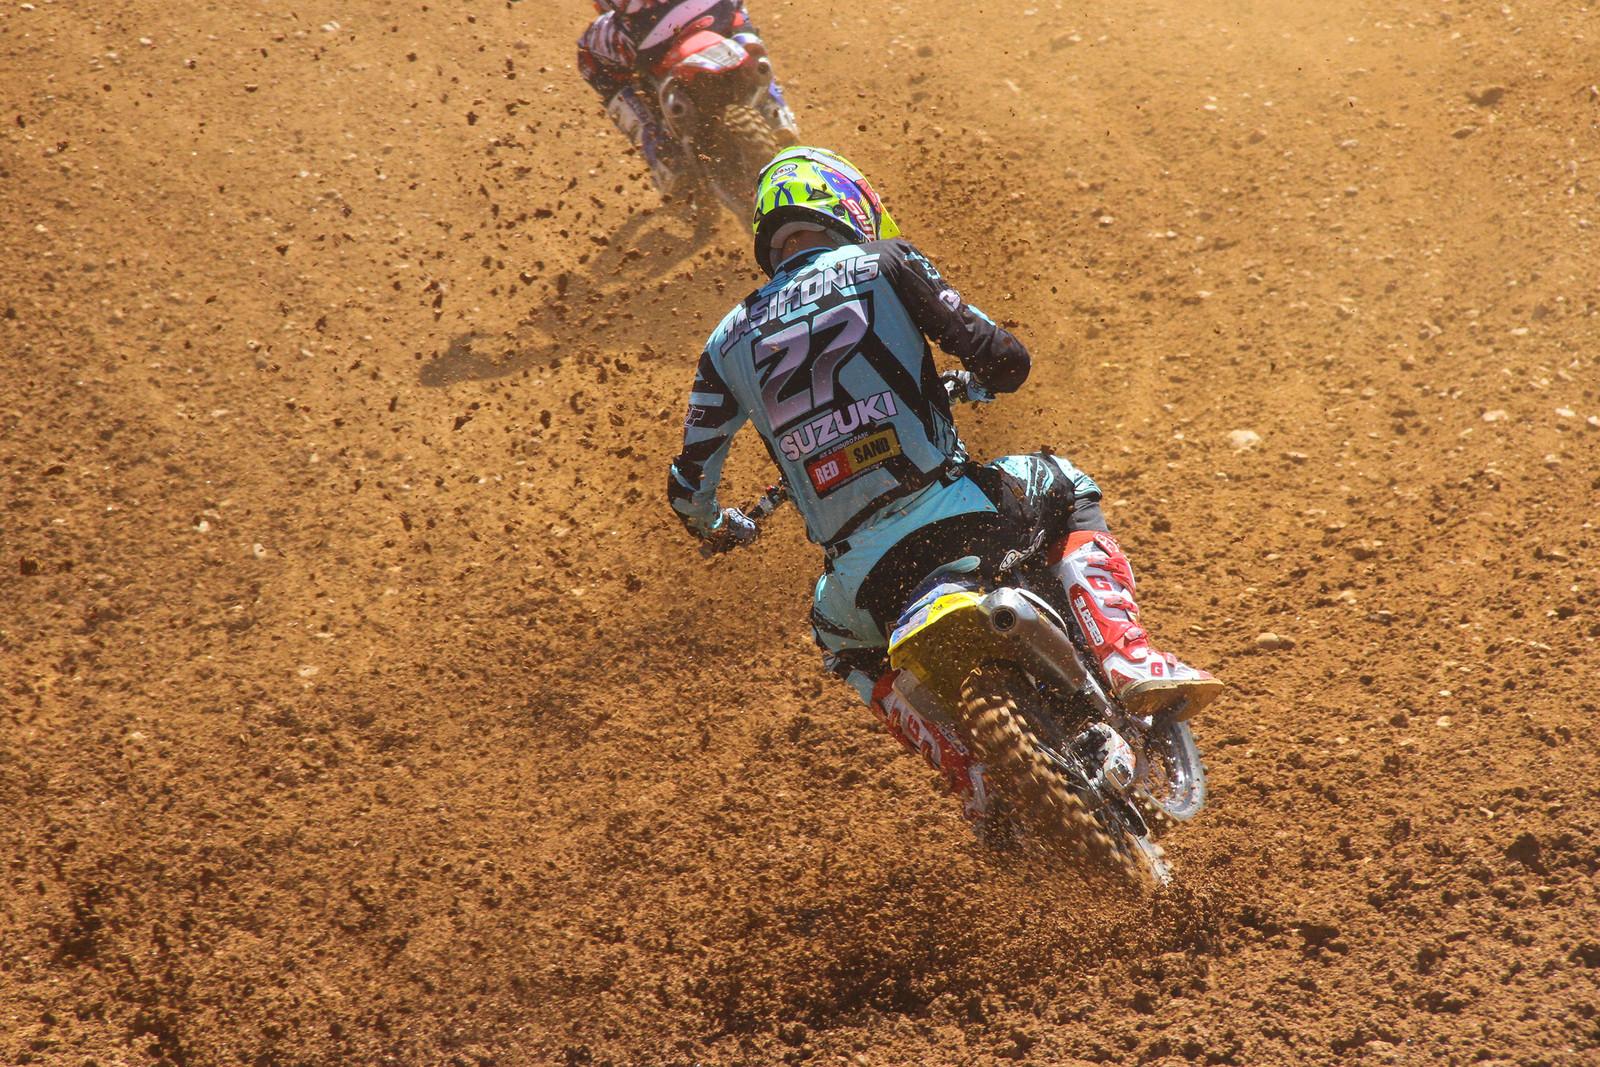 Arminas Jasikonis - ayearinmx - Motocross Pictures - Vital MX